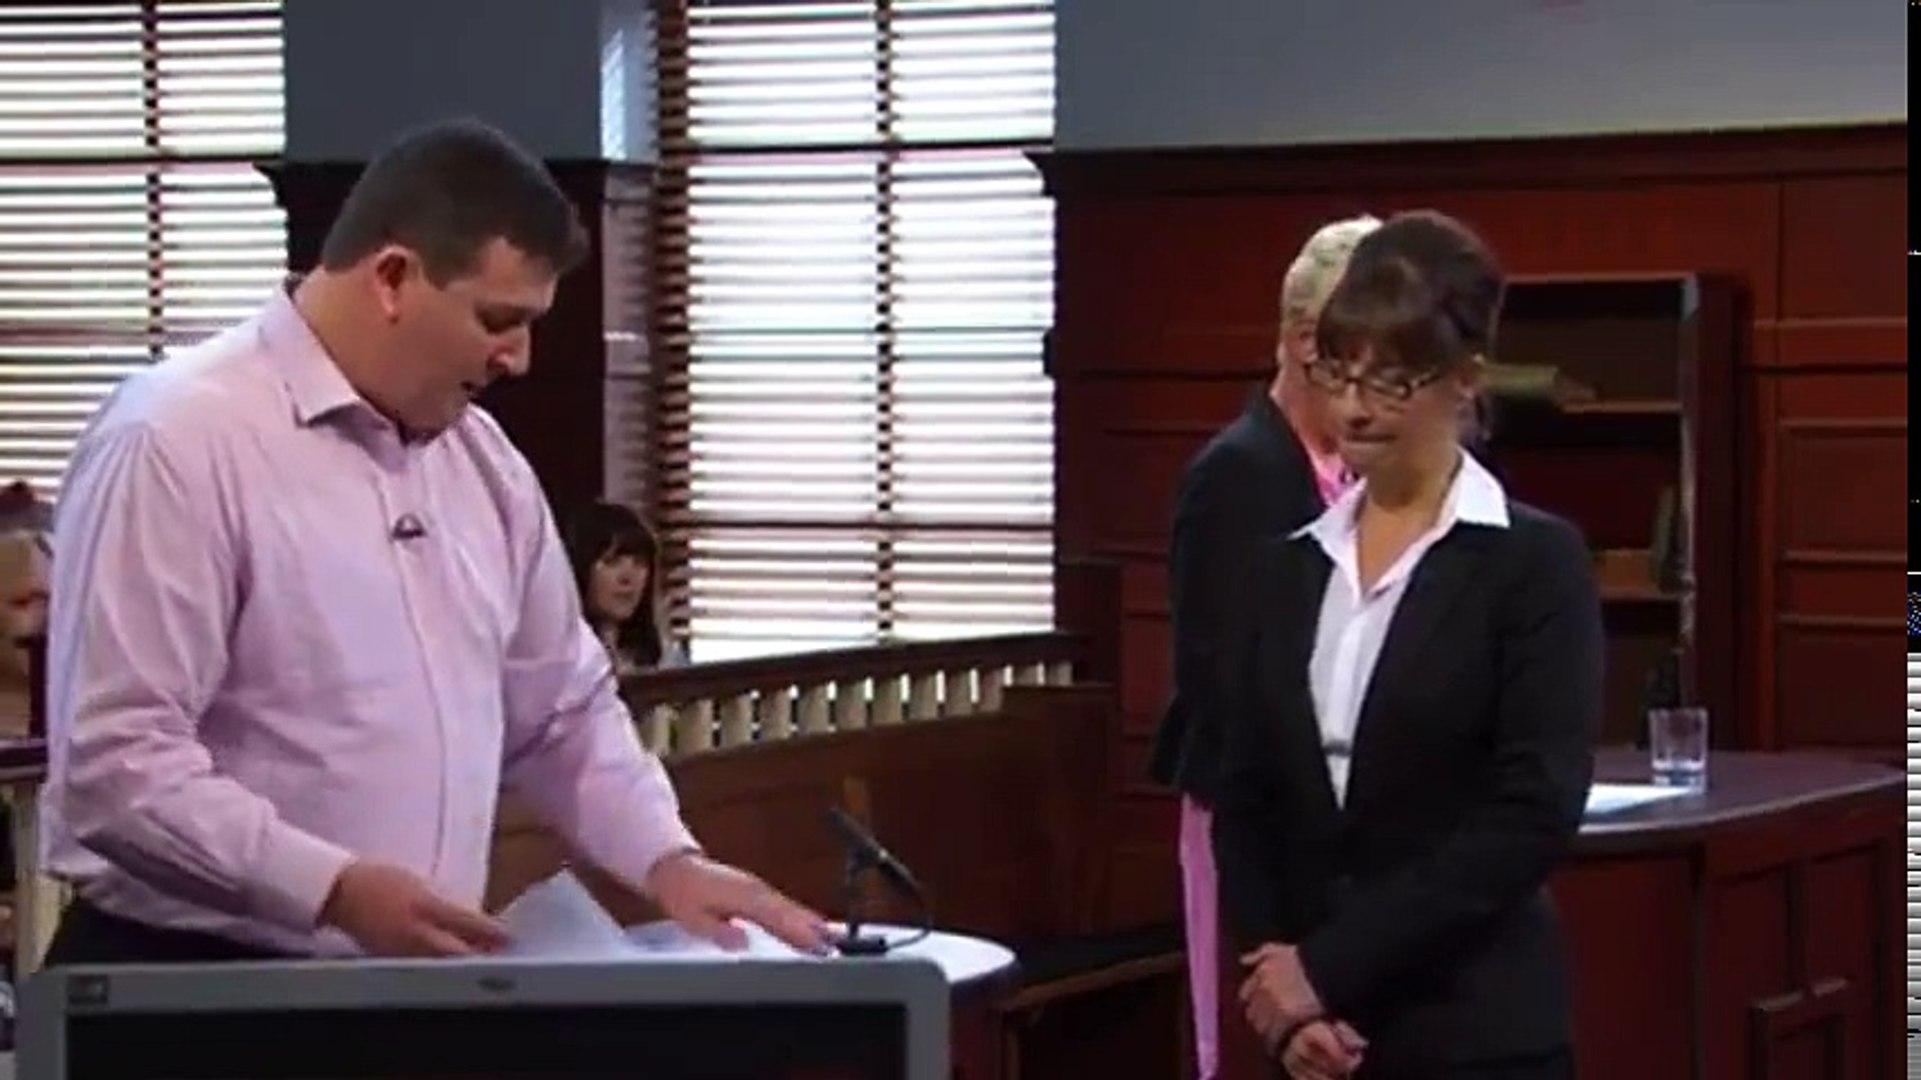 Judge Rinder S01 - Ep02 Ian V Martin, Liam V Josh, Jenny V Alison HD Watch